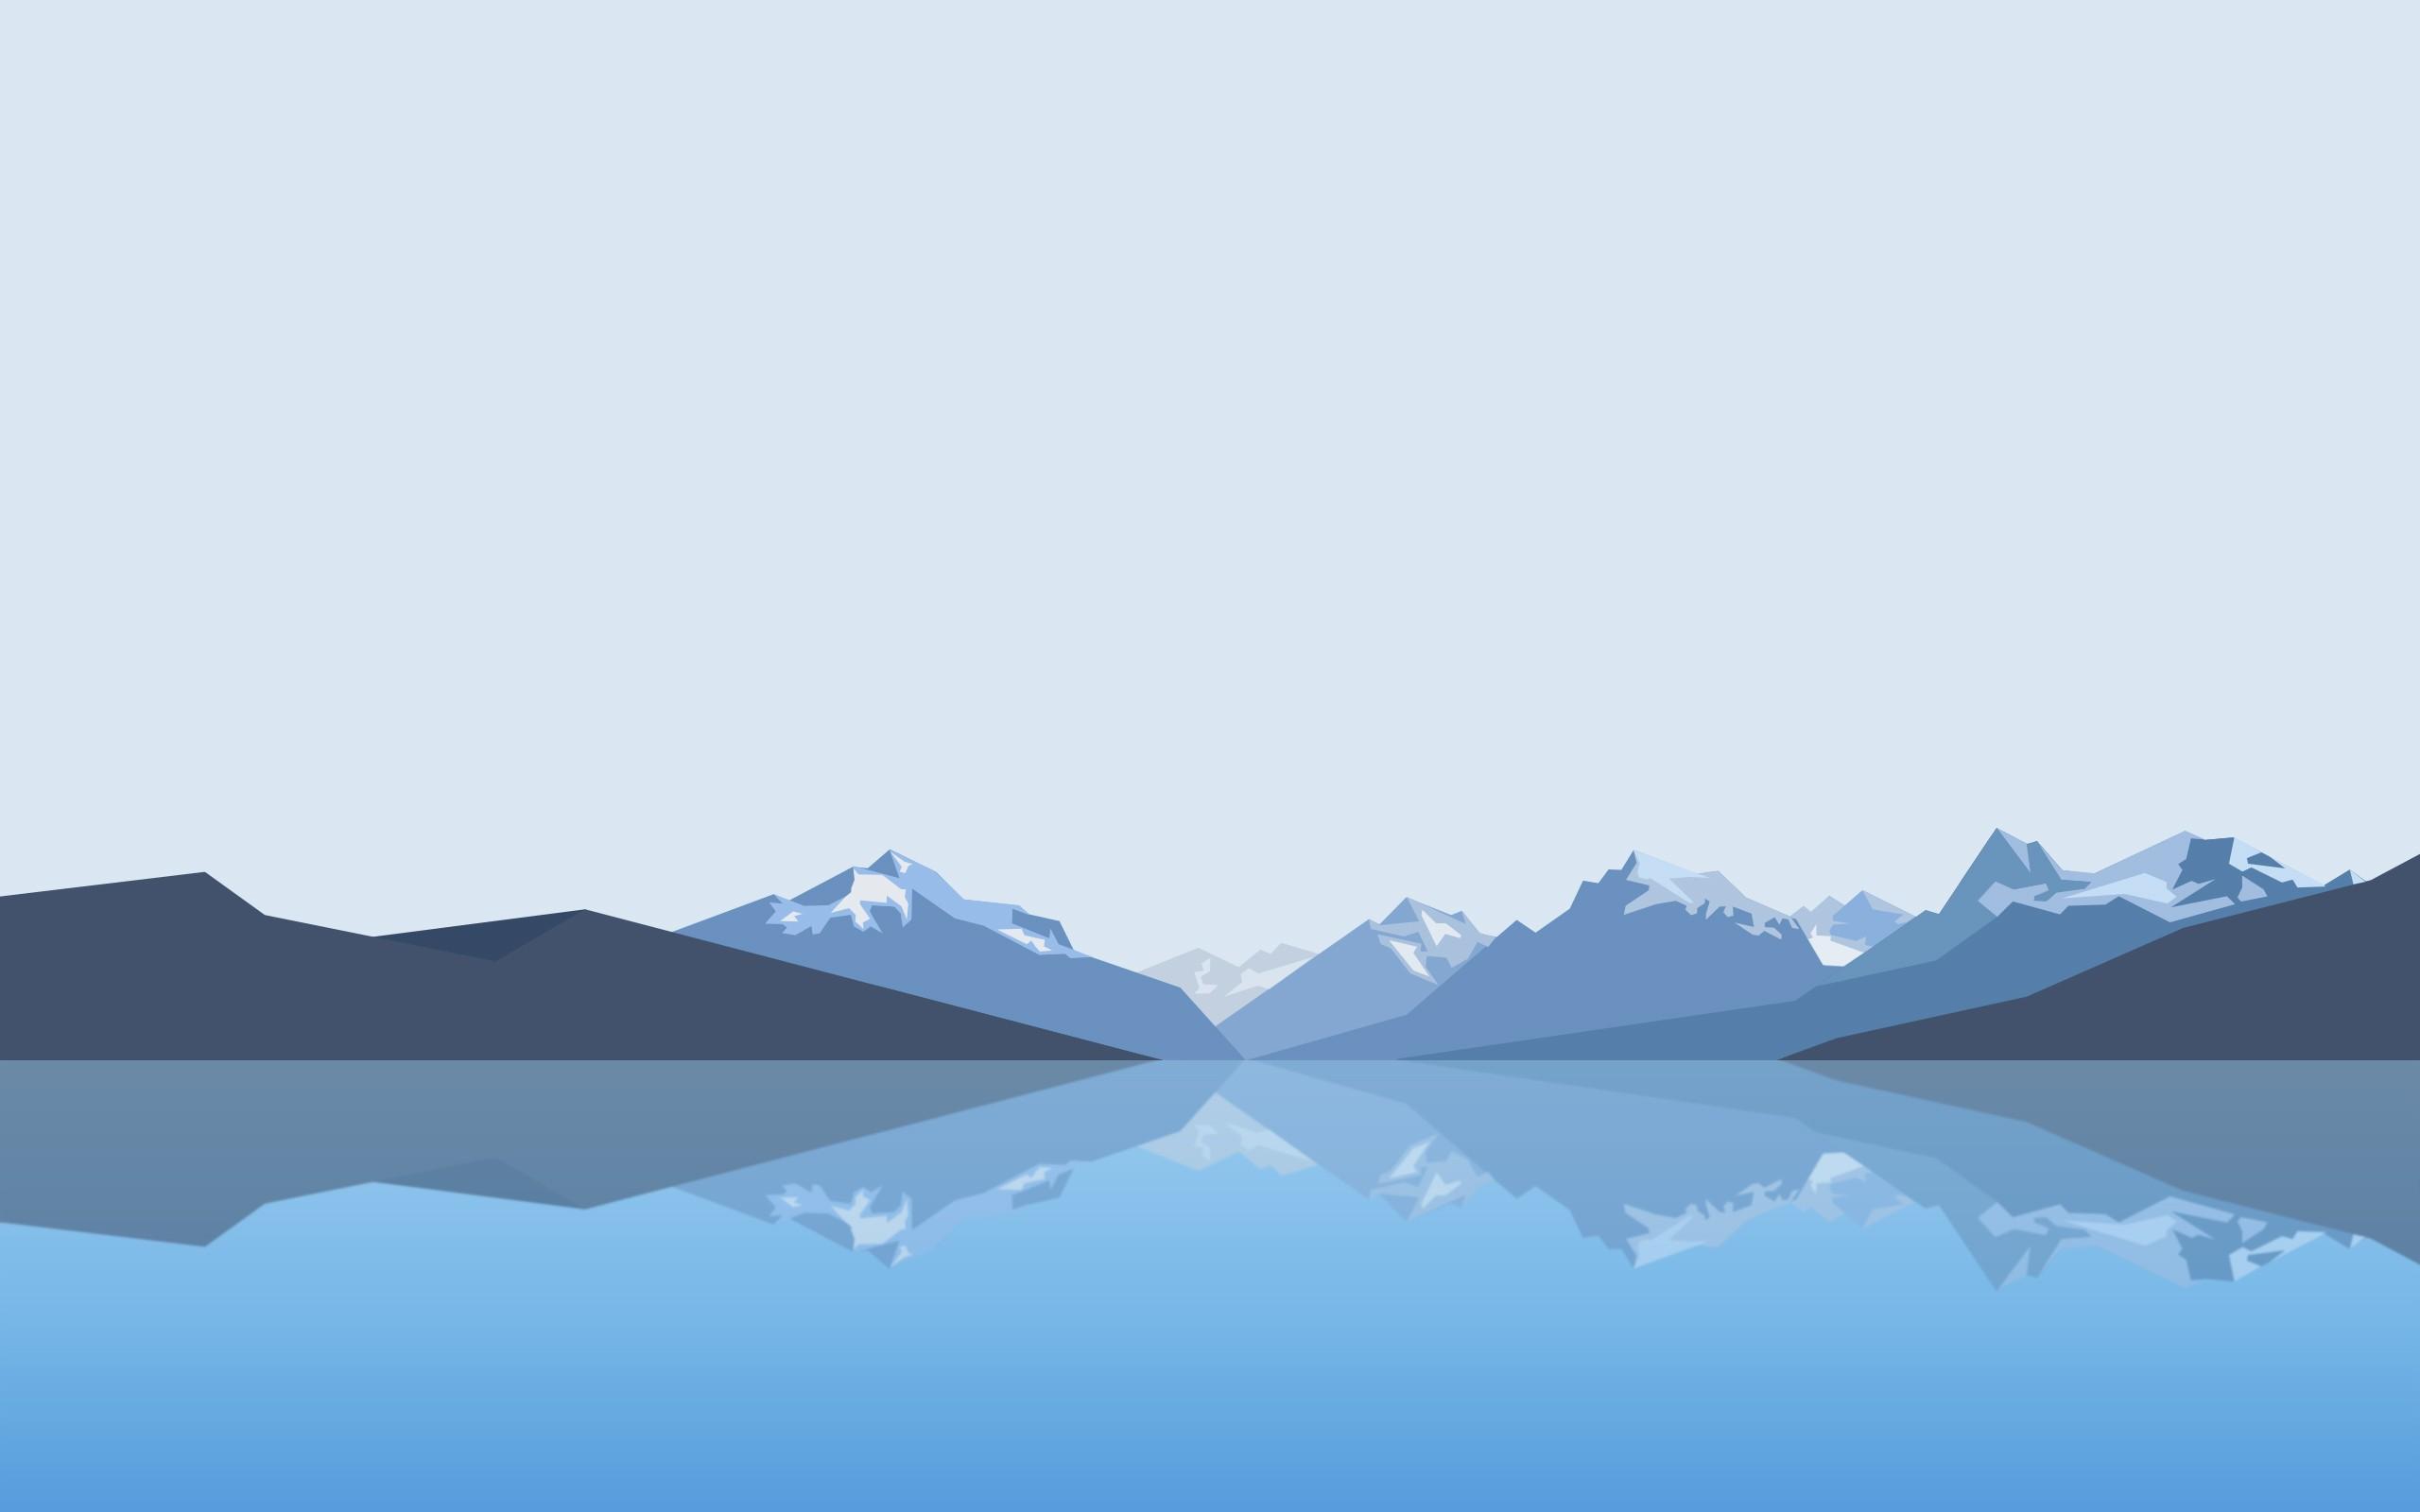 Wallpaper Landscape Mountains Lake Minimalism